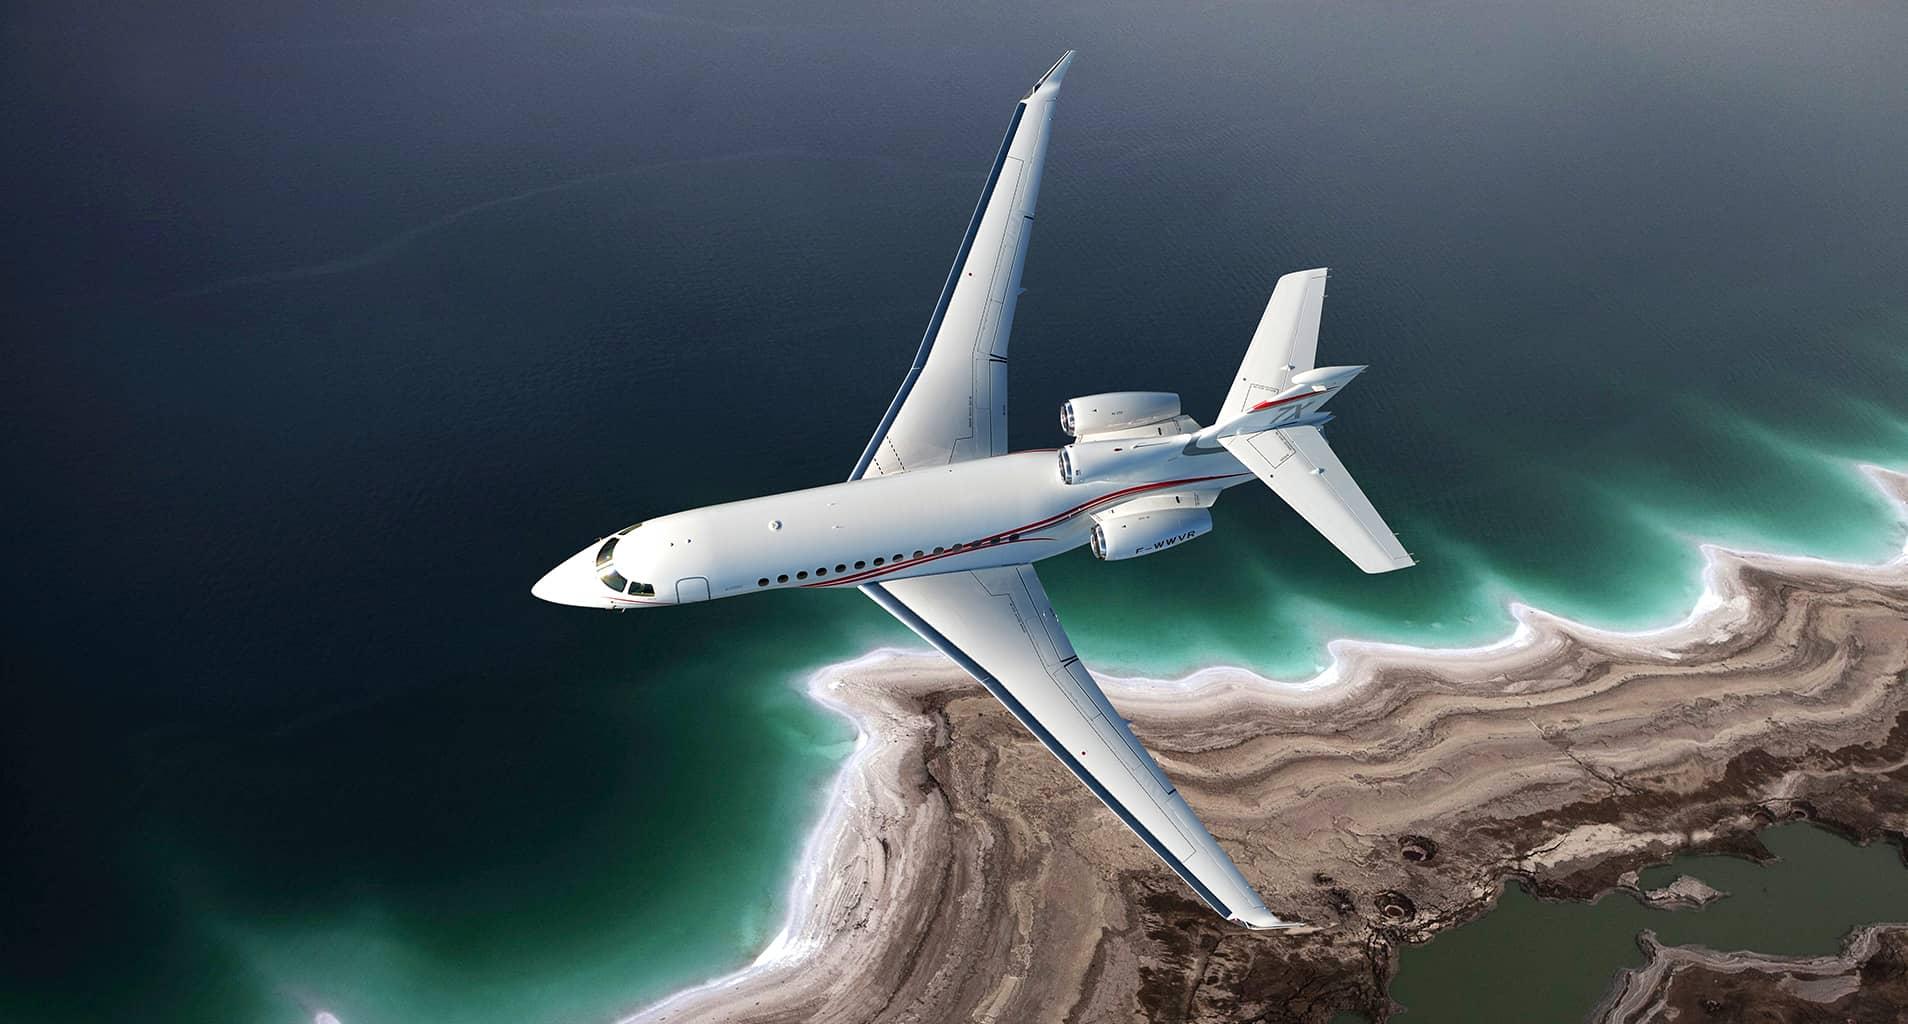 Atlanta Falcons Wallpaper Engine: Private Jet Charter In UAE